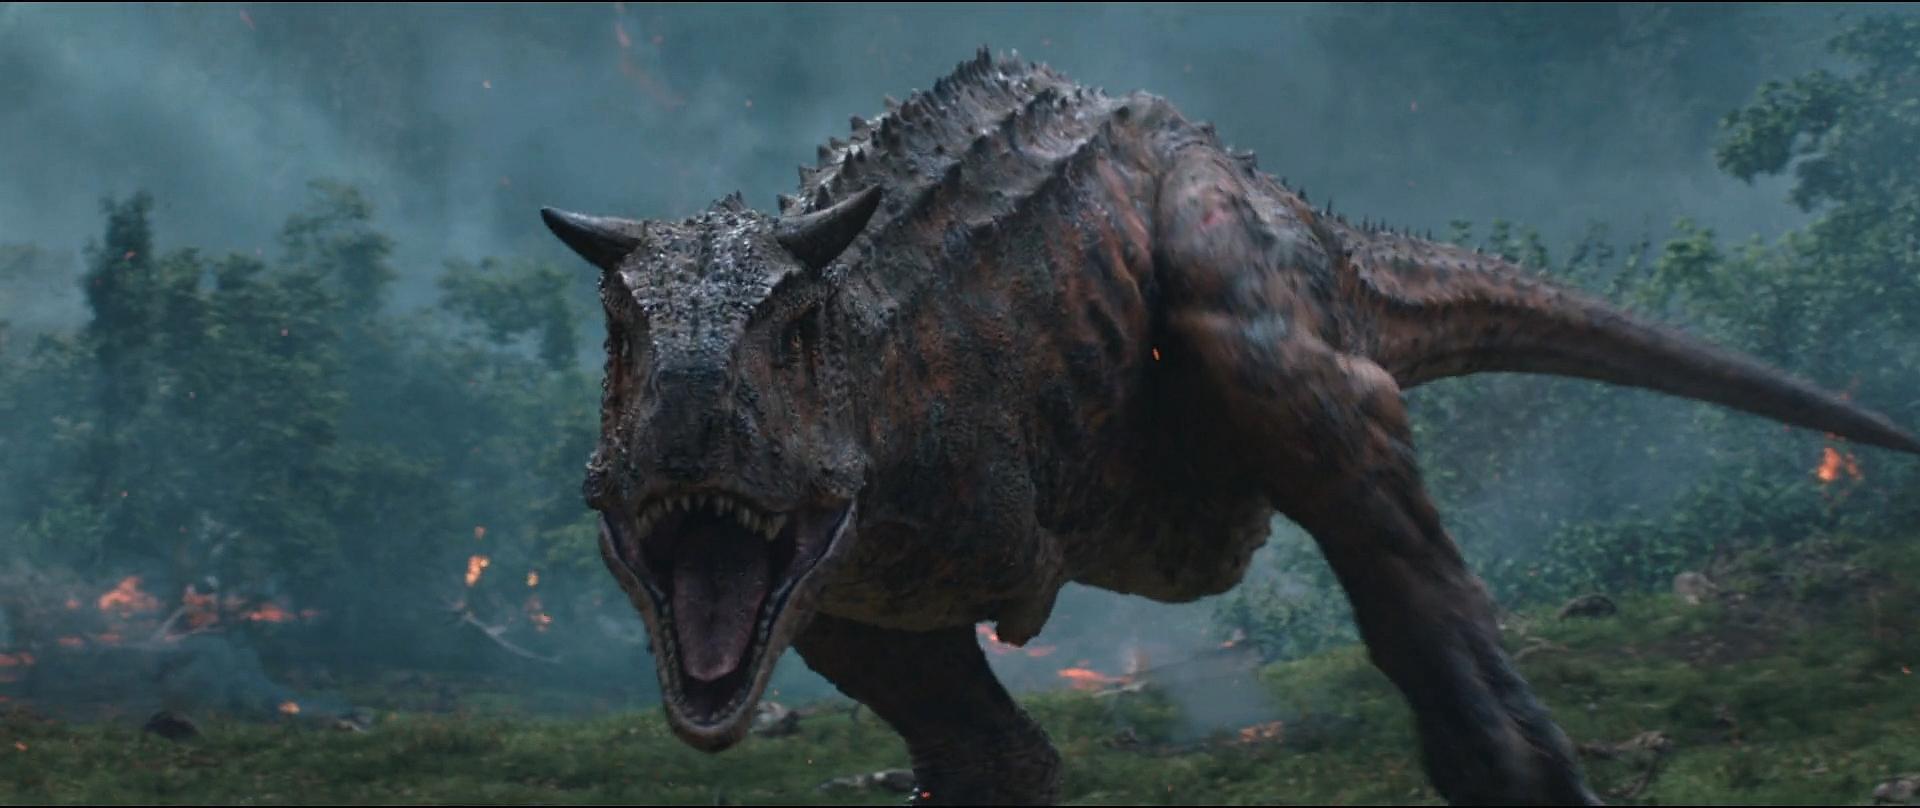 Jurassic World Fallen Kingdom Carnotaurus 2 by GiuseppeDiRosso on 1920x808